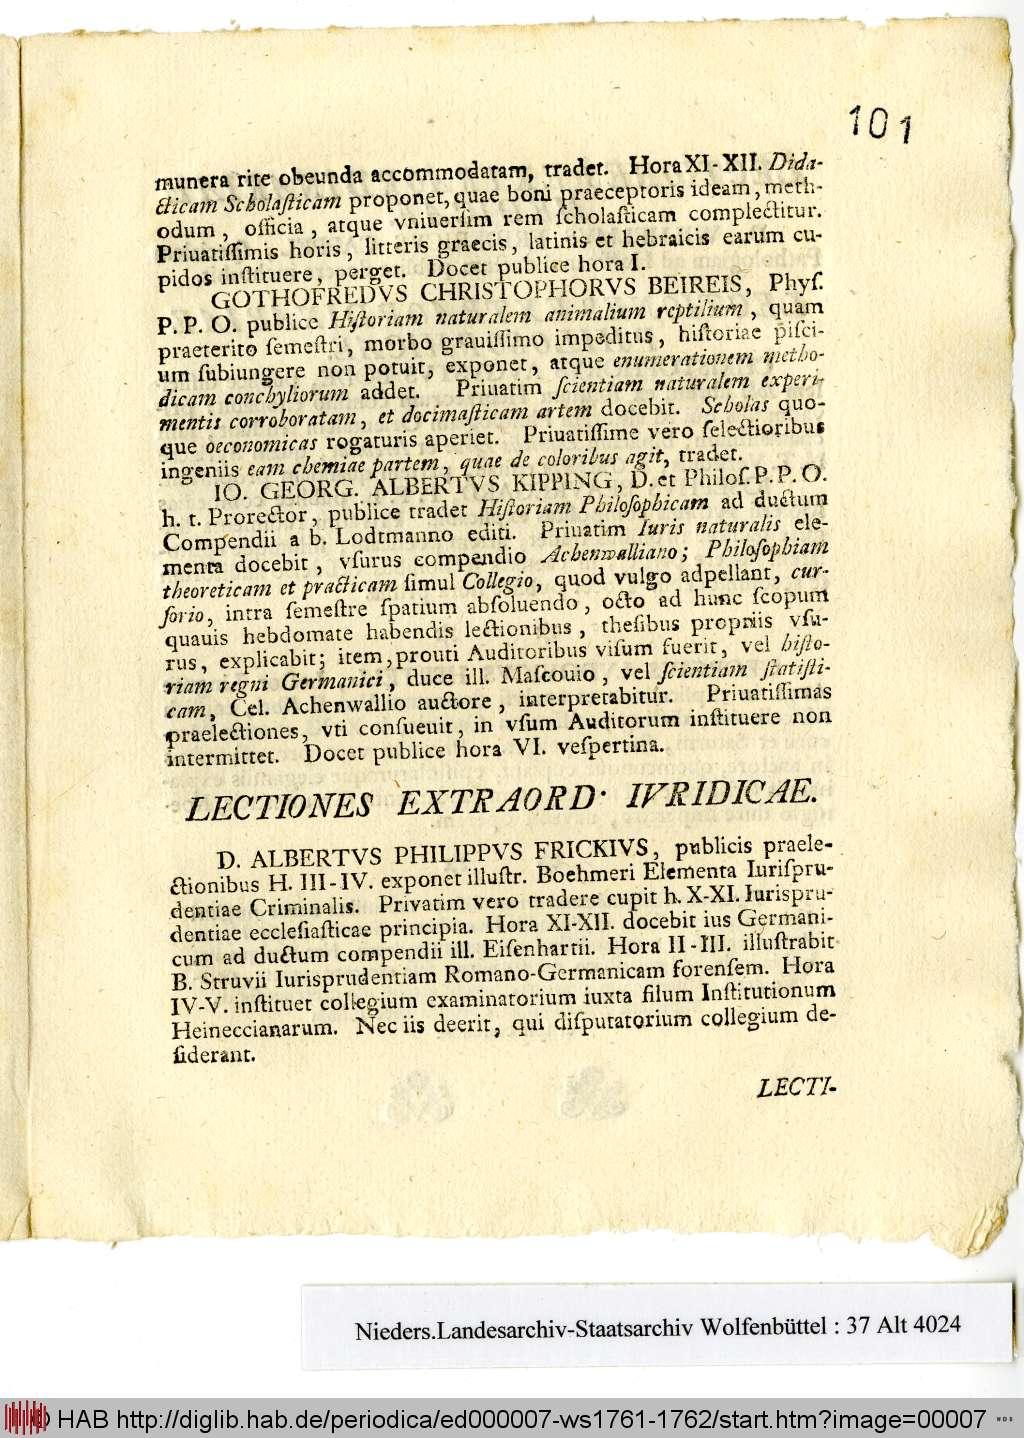 https://diglib.hab.de/periodica/ed000007-ws1761-1762/00007.jpg